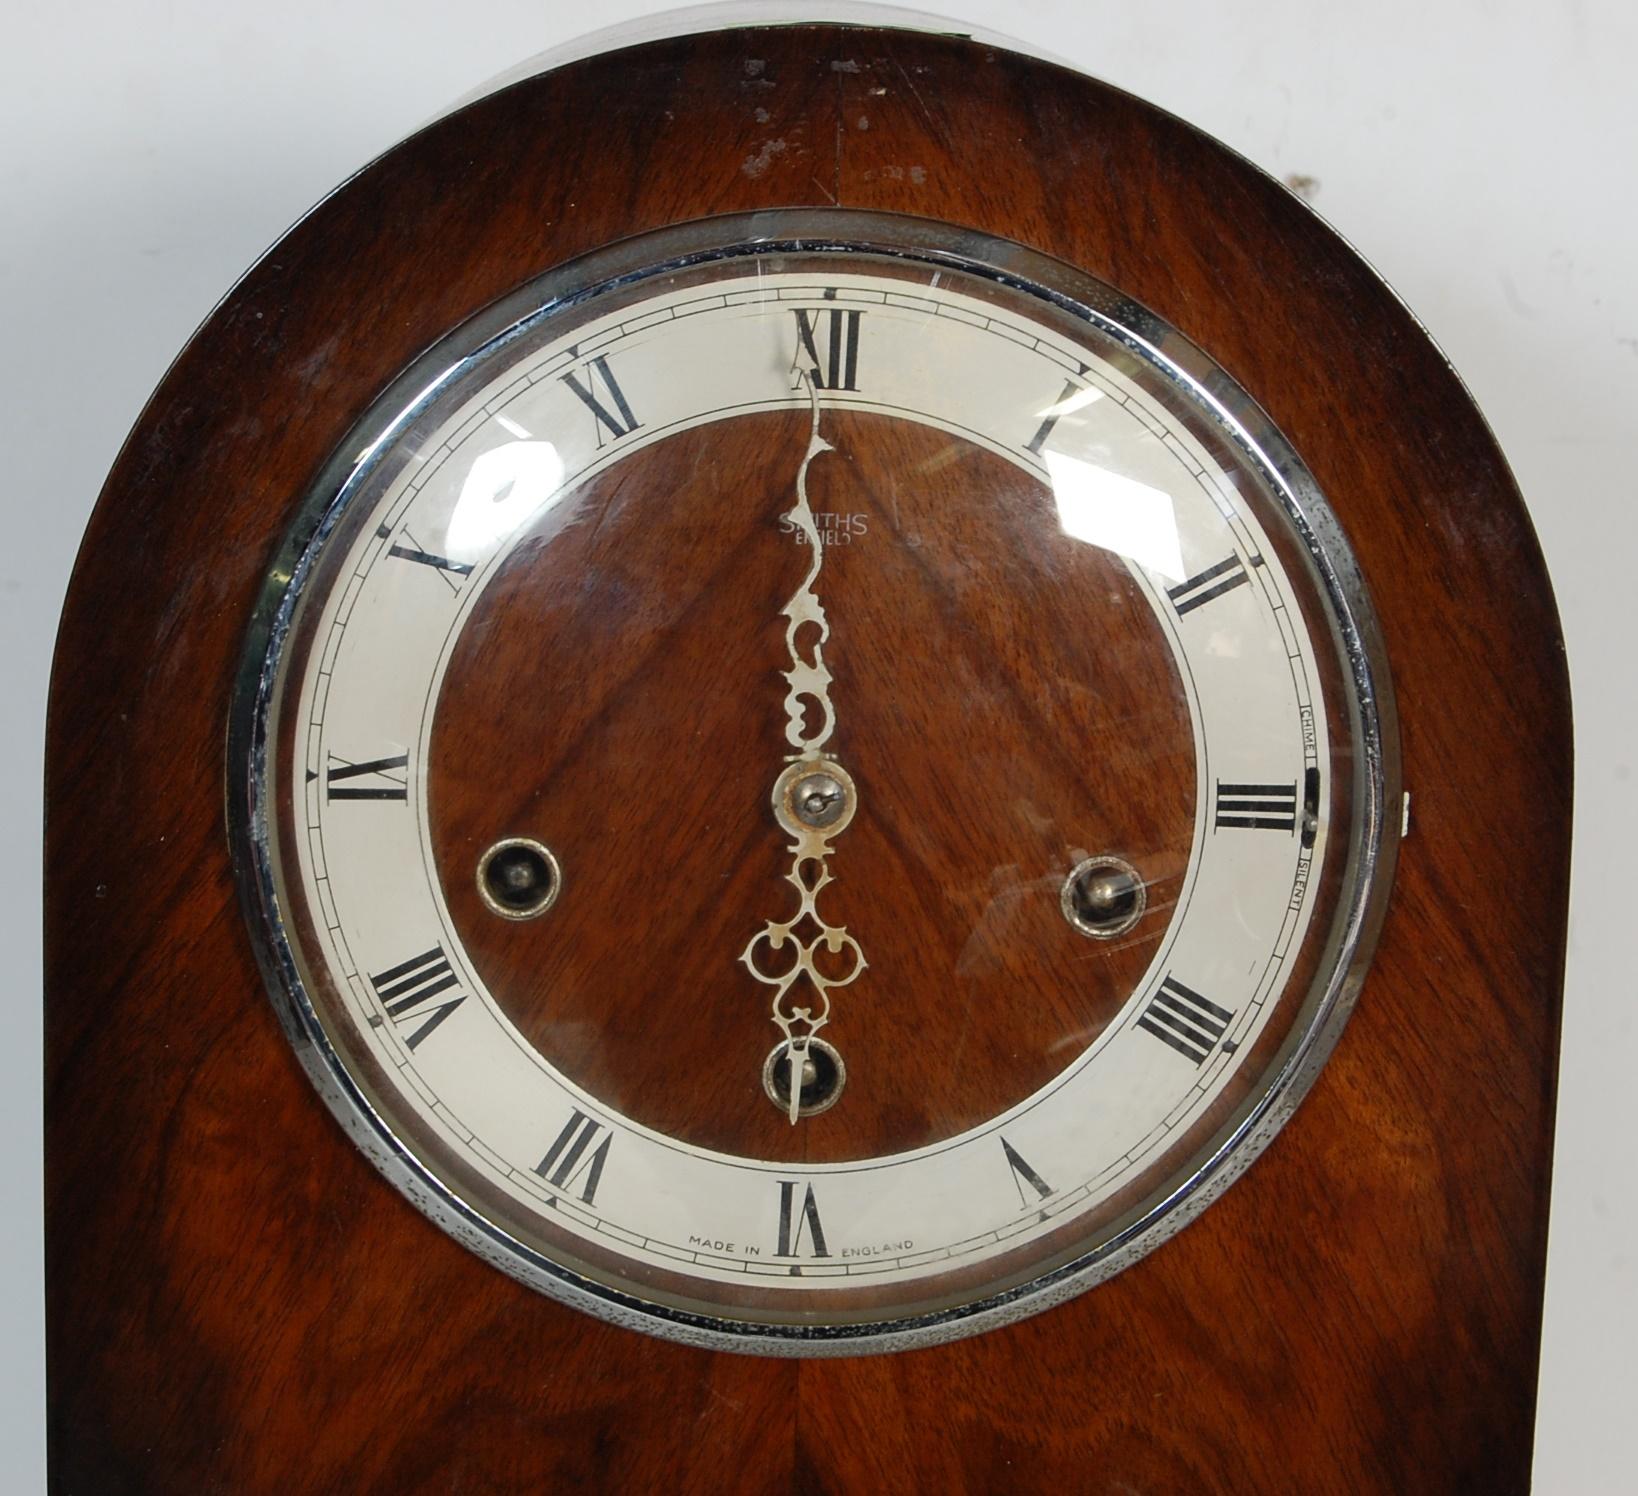 EARLY 20TH CENTURY 1930S WALNUT VENEER 8 DAY GRANDMOTHER CLOCK - Image 2 of 8